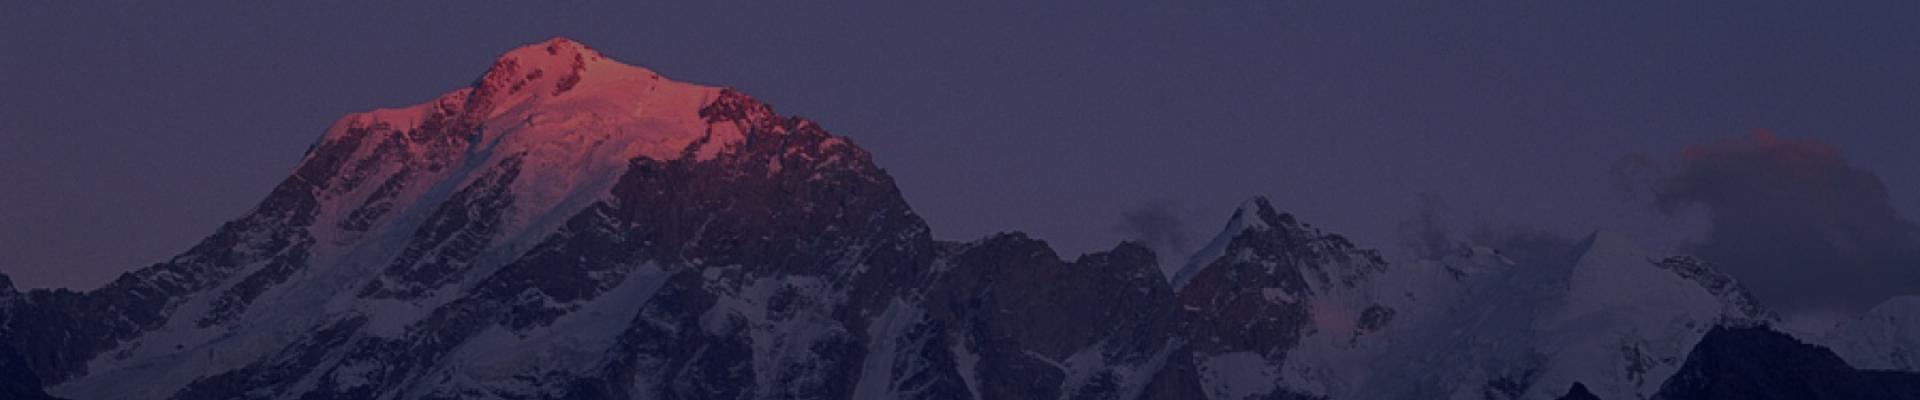 Khar Myundari trek in Himachal Pradesh, India